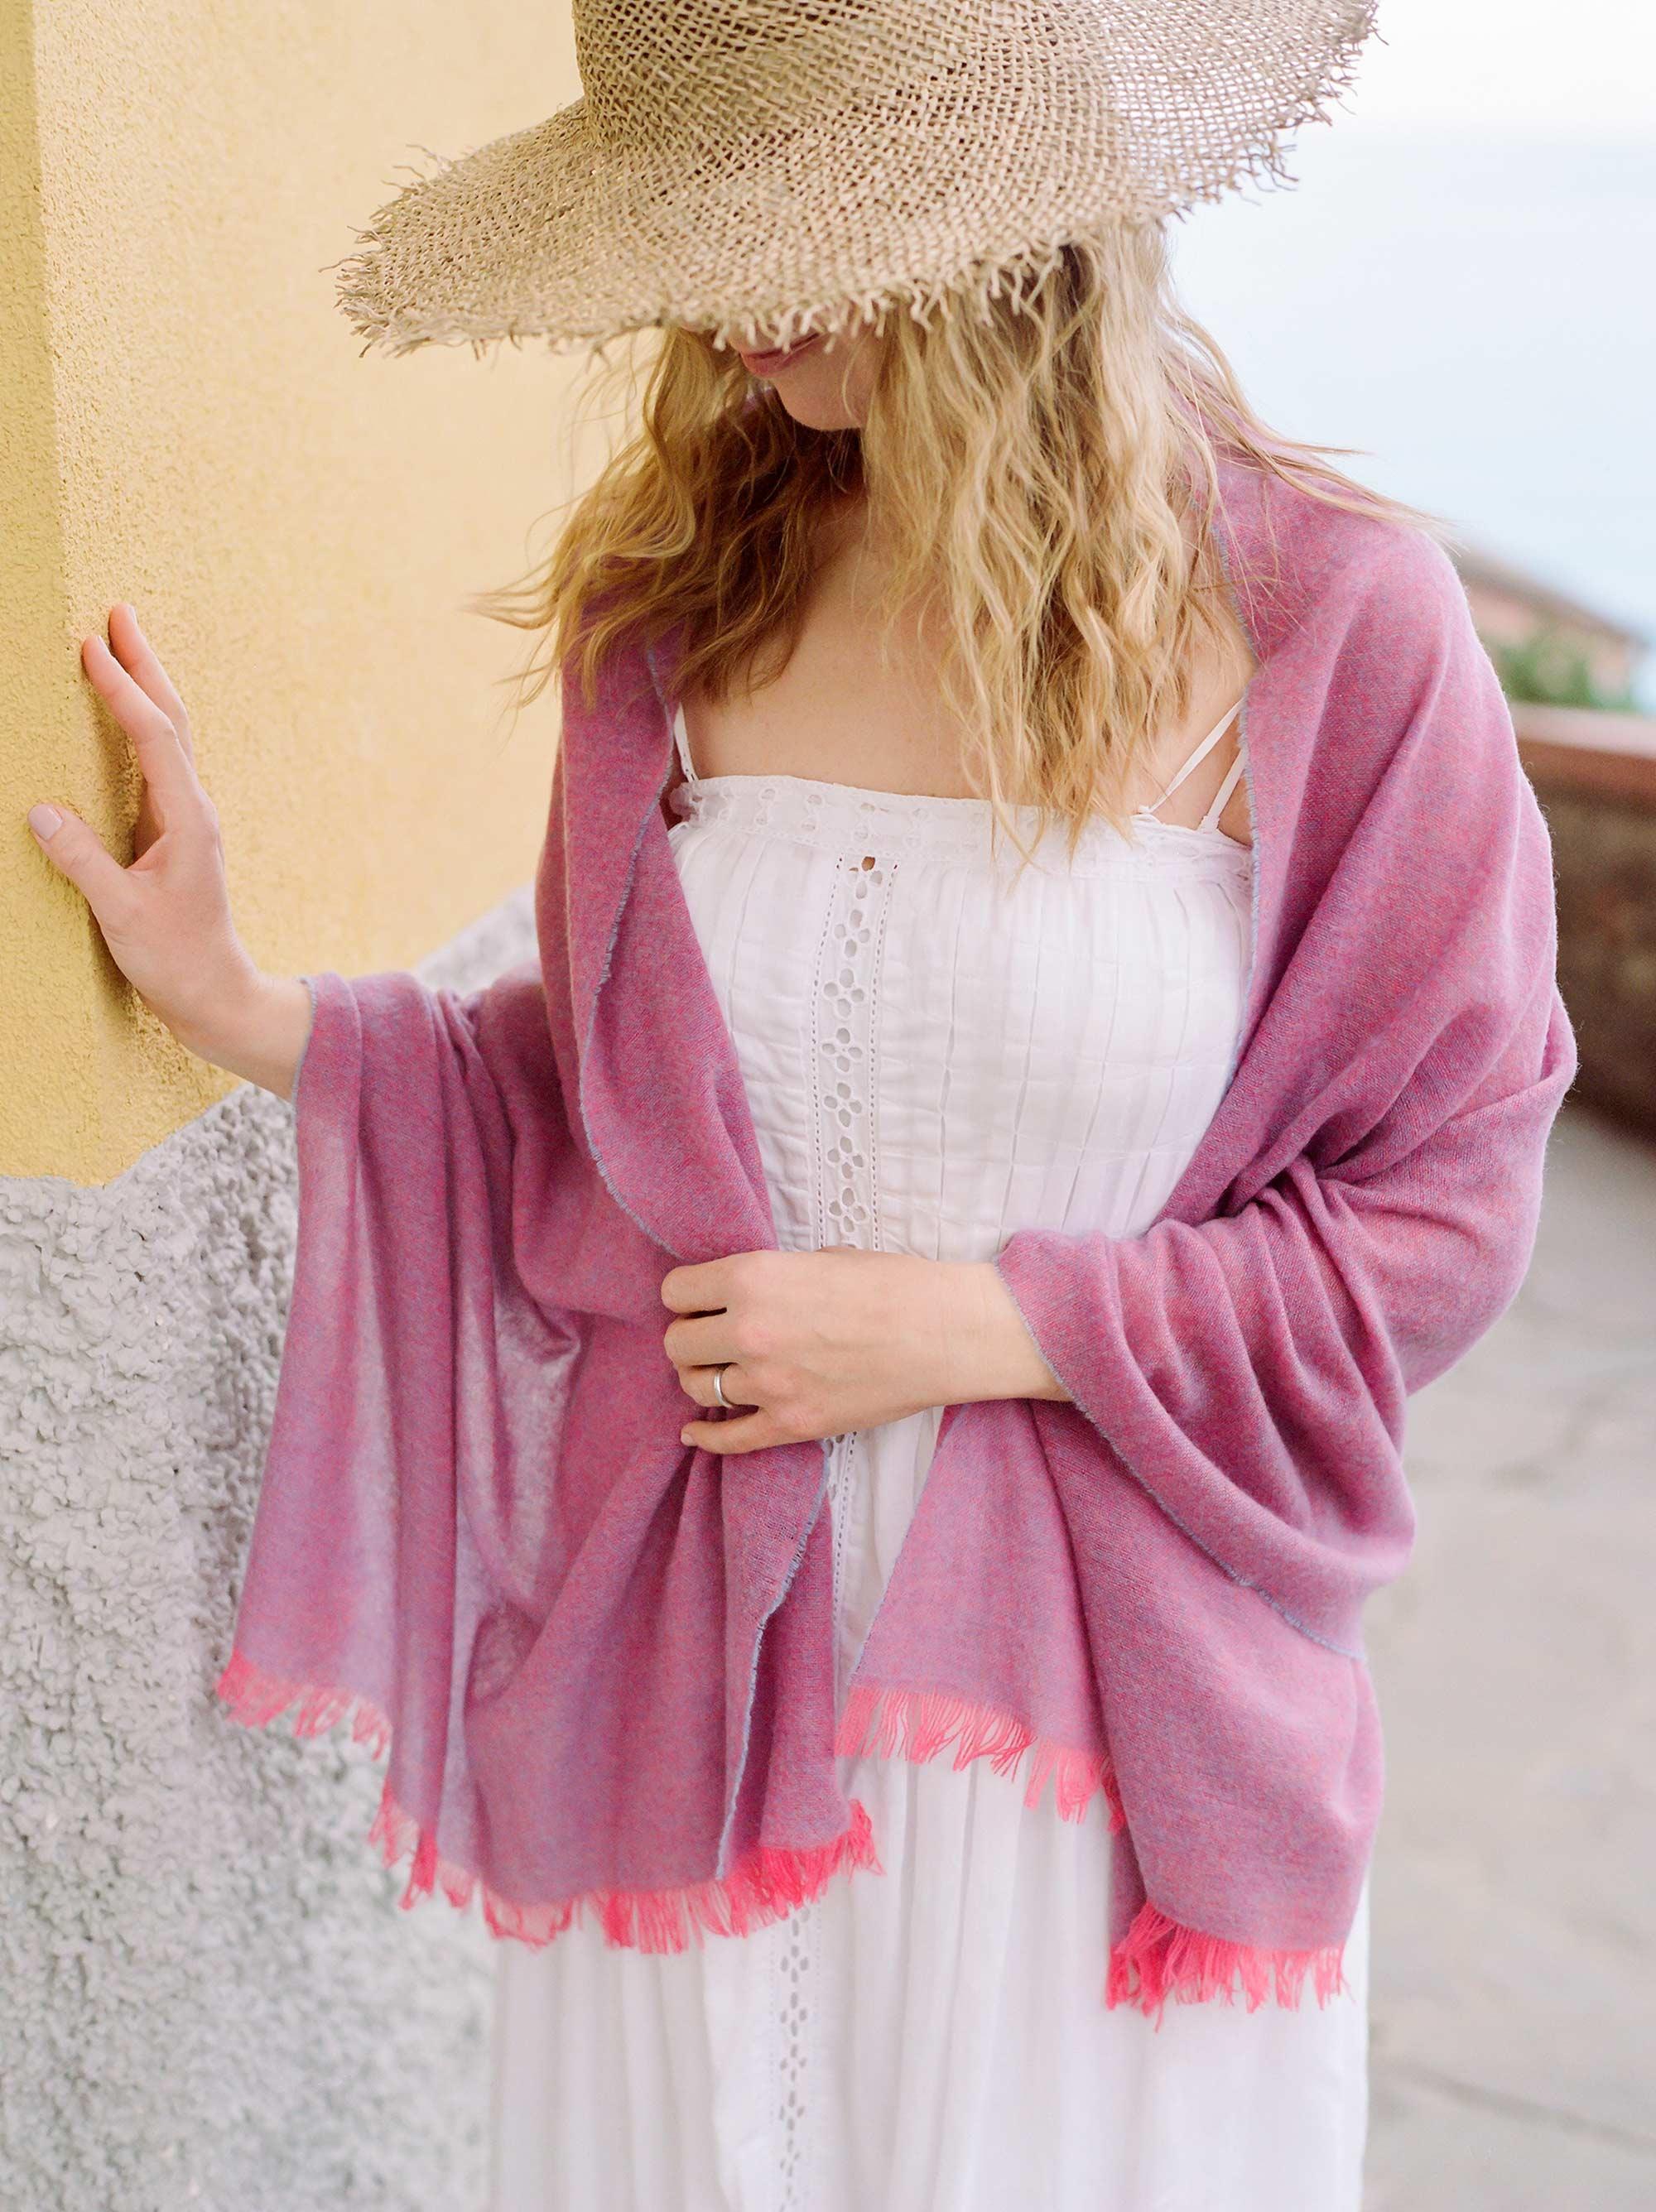 7 jennie-hogg-founder-of-lois-avery-italian-cashmere-scarves.jpg